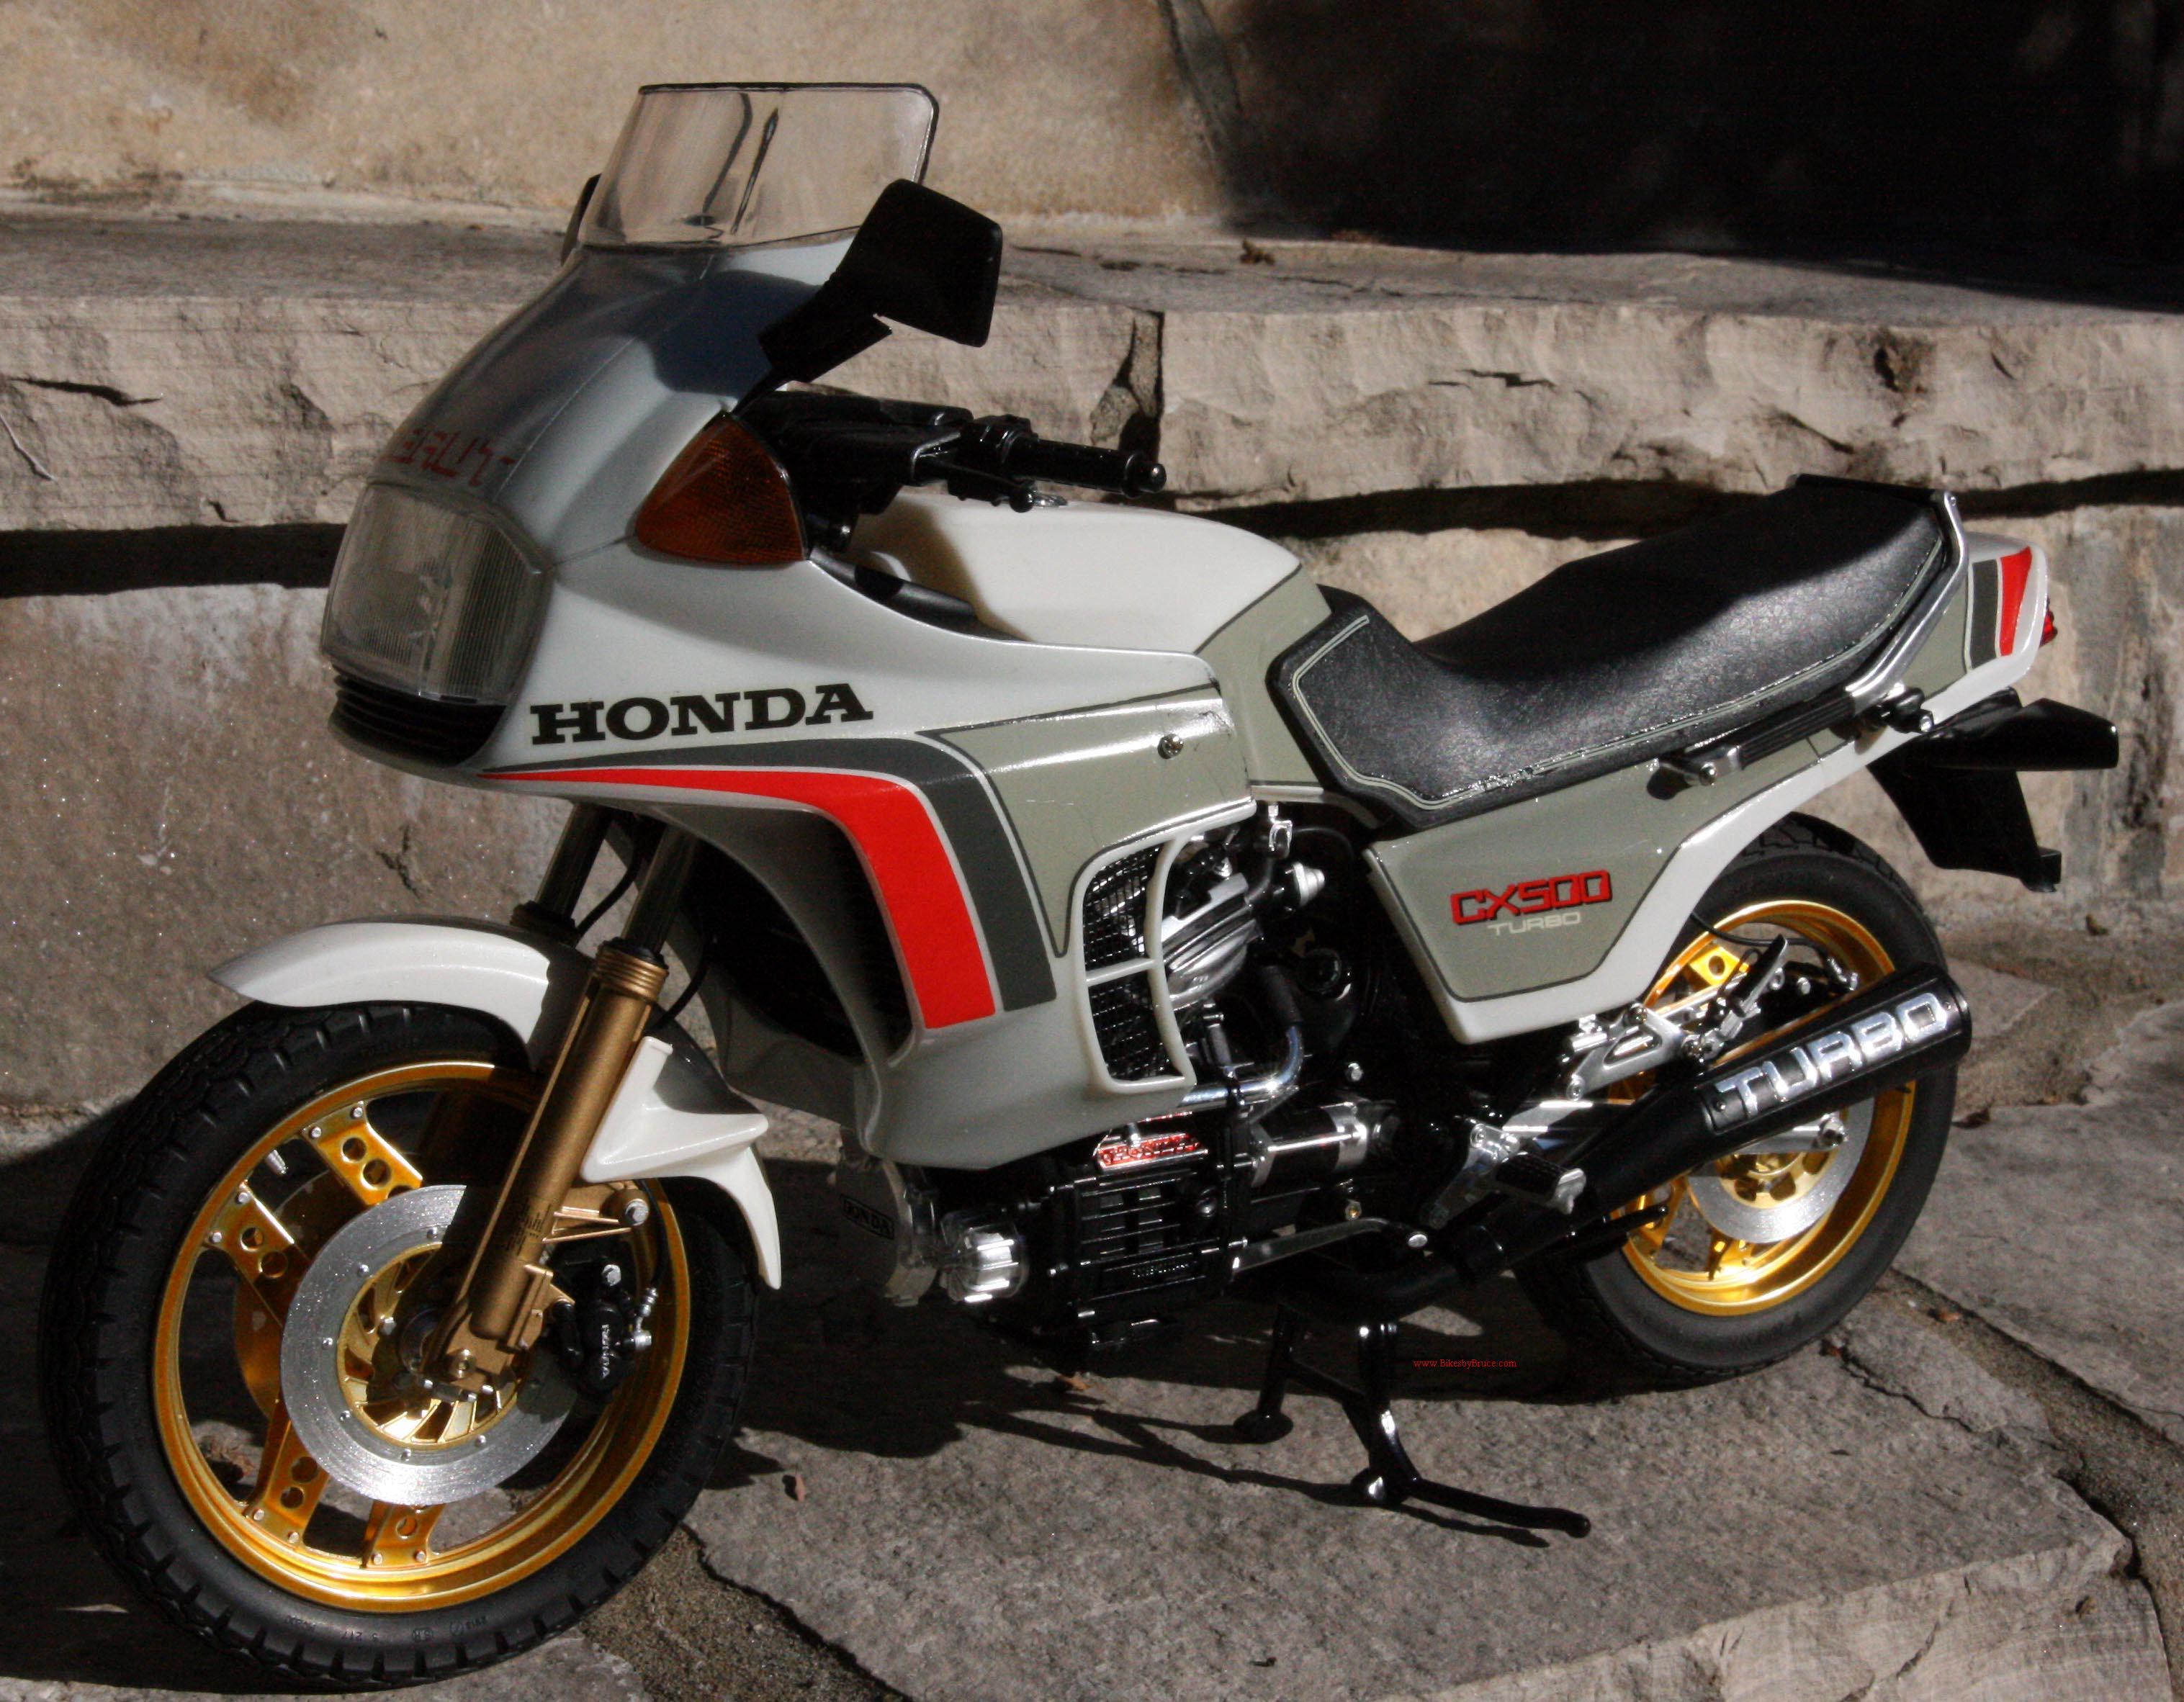 Bikes By Bruce - Honda